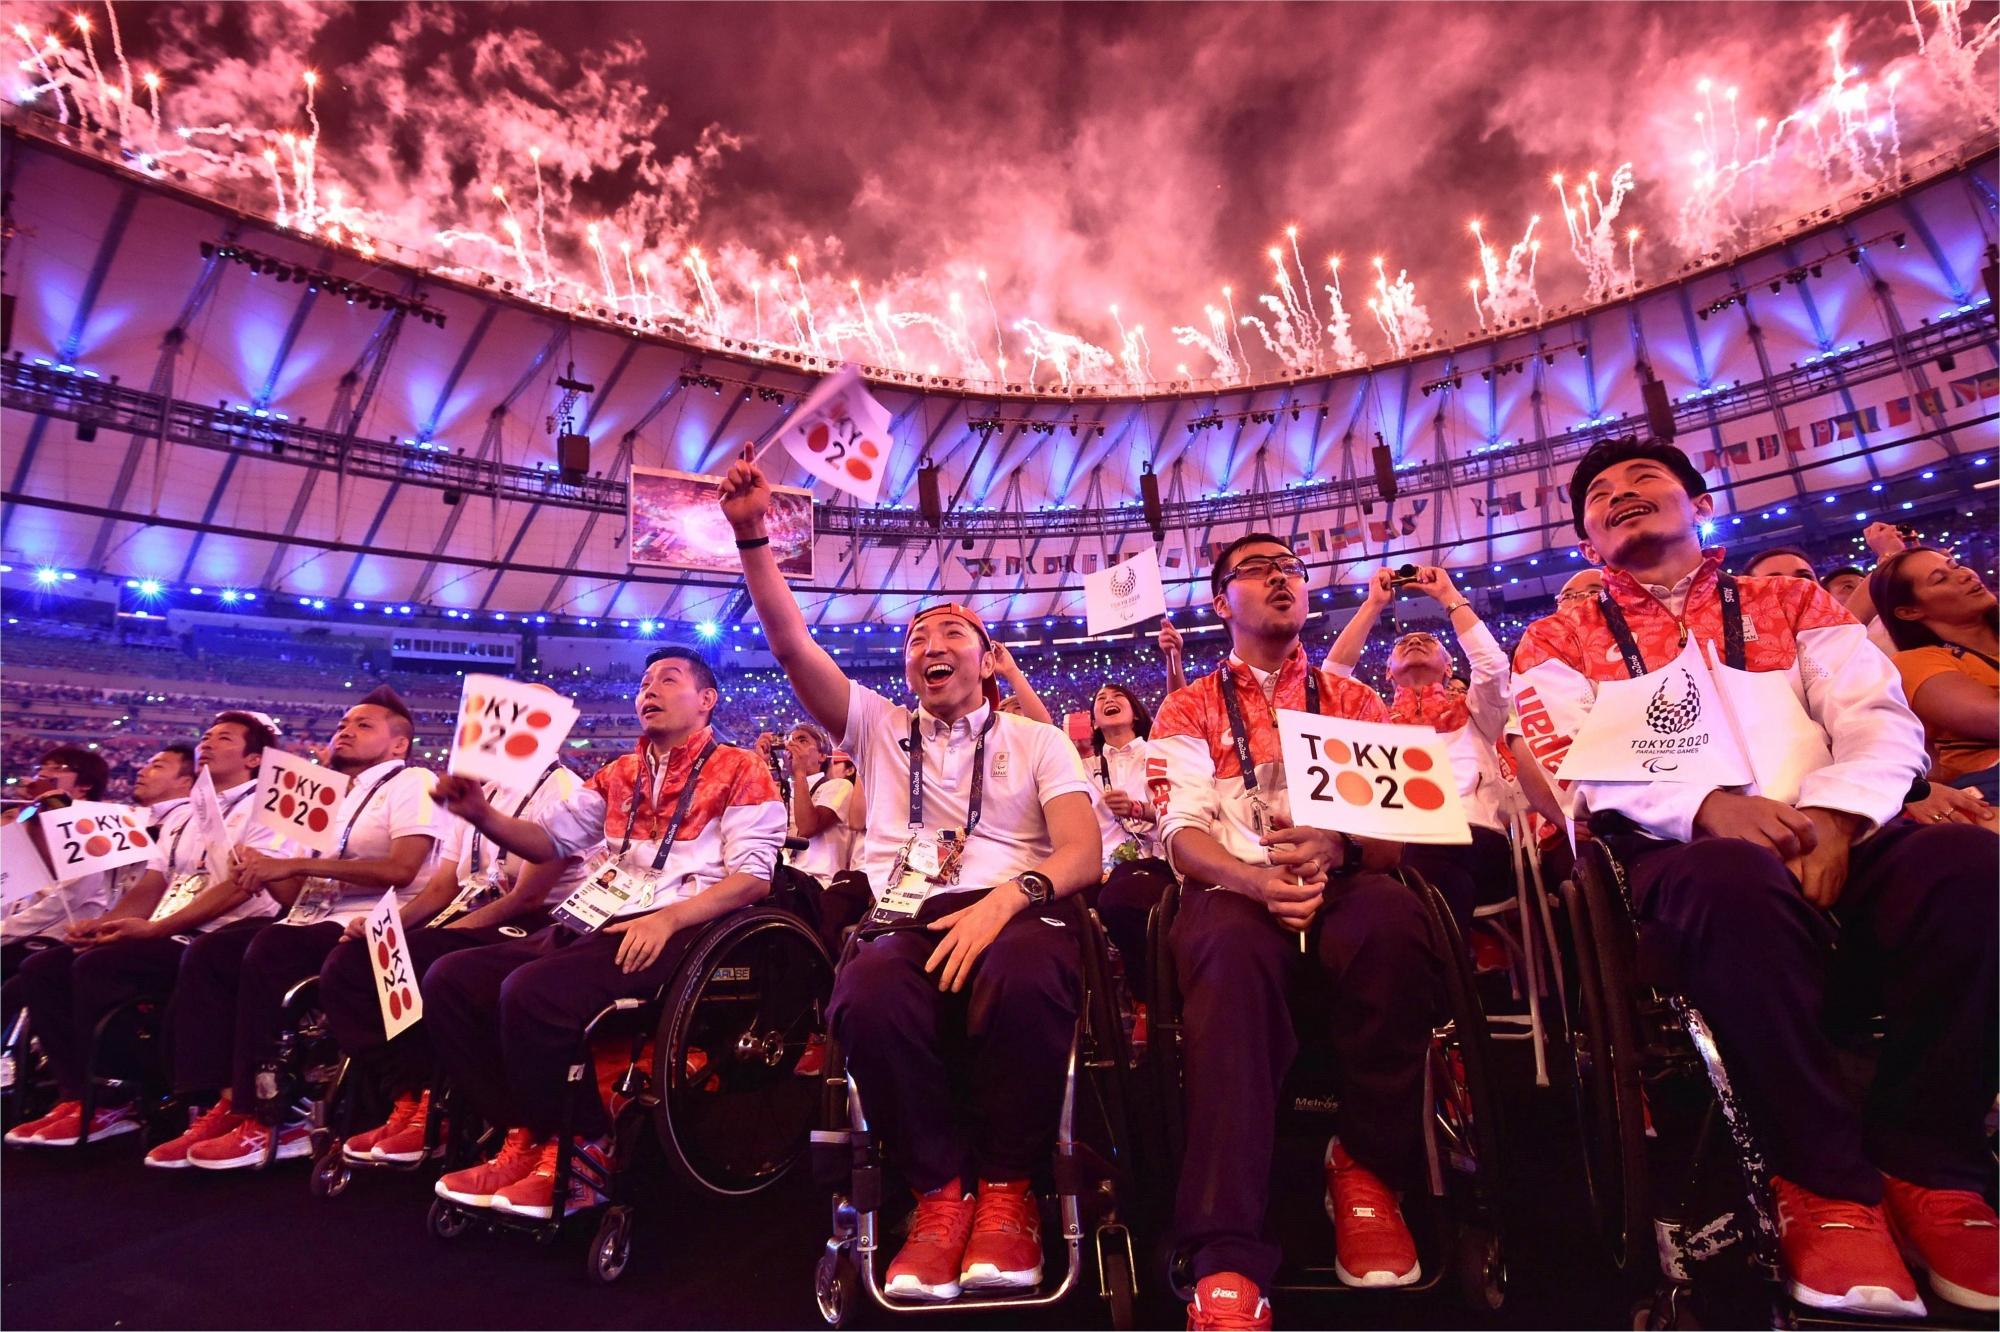 Athletes competing at Tokyo 2020 Paralympic Games